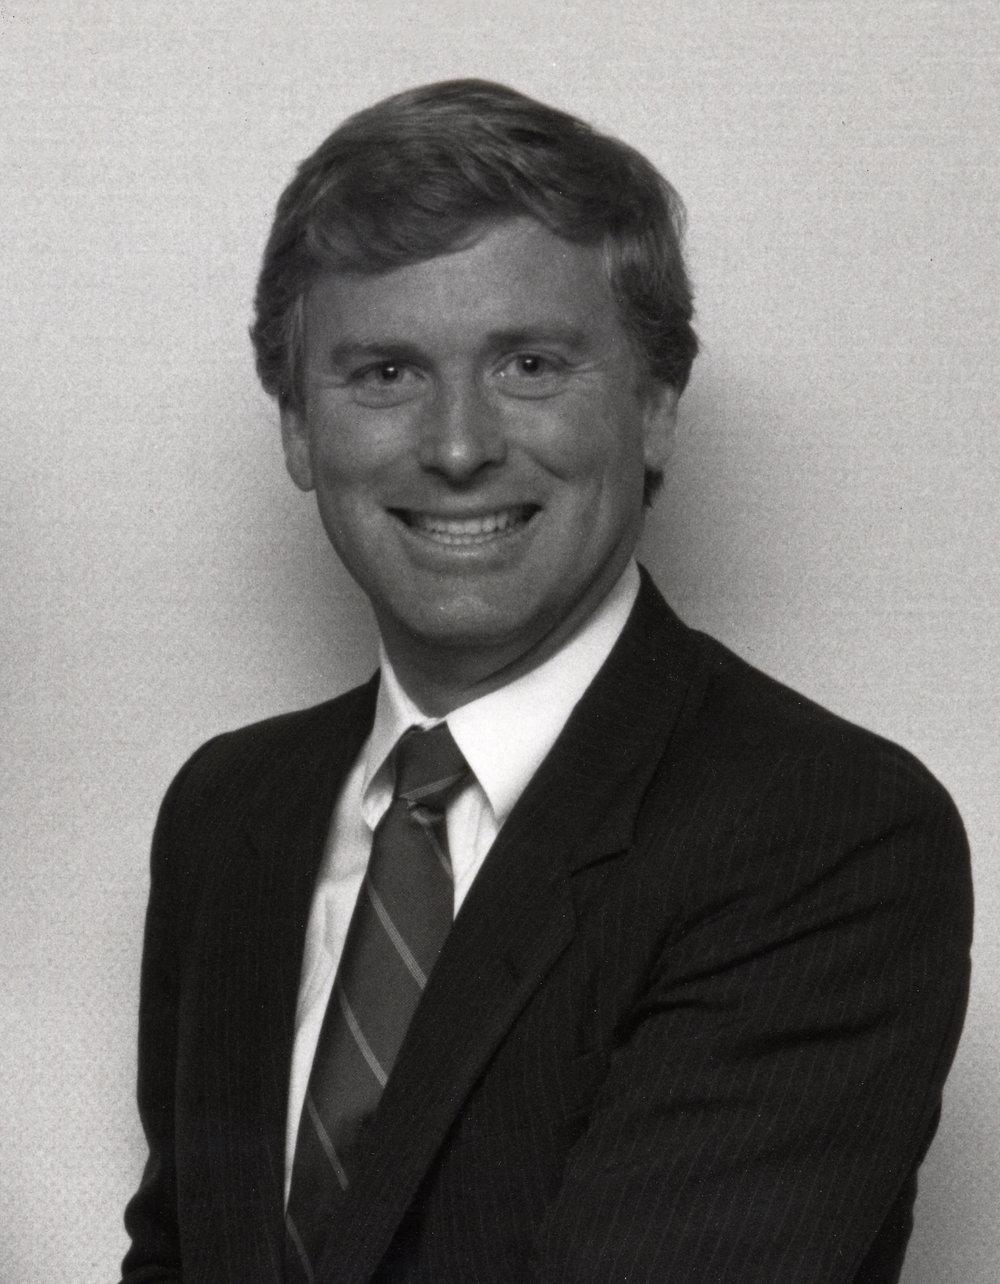 Vice President  Dan Quayle056.jpg